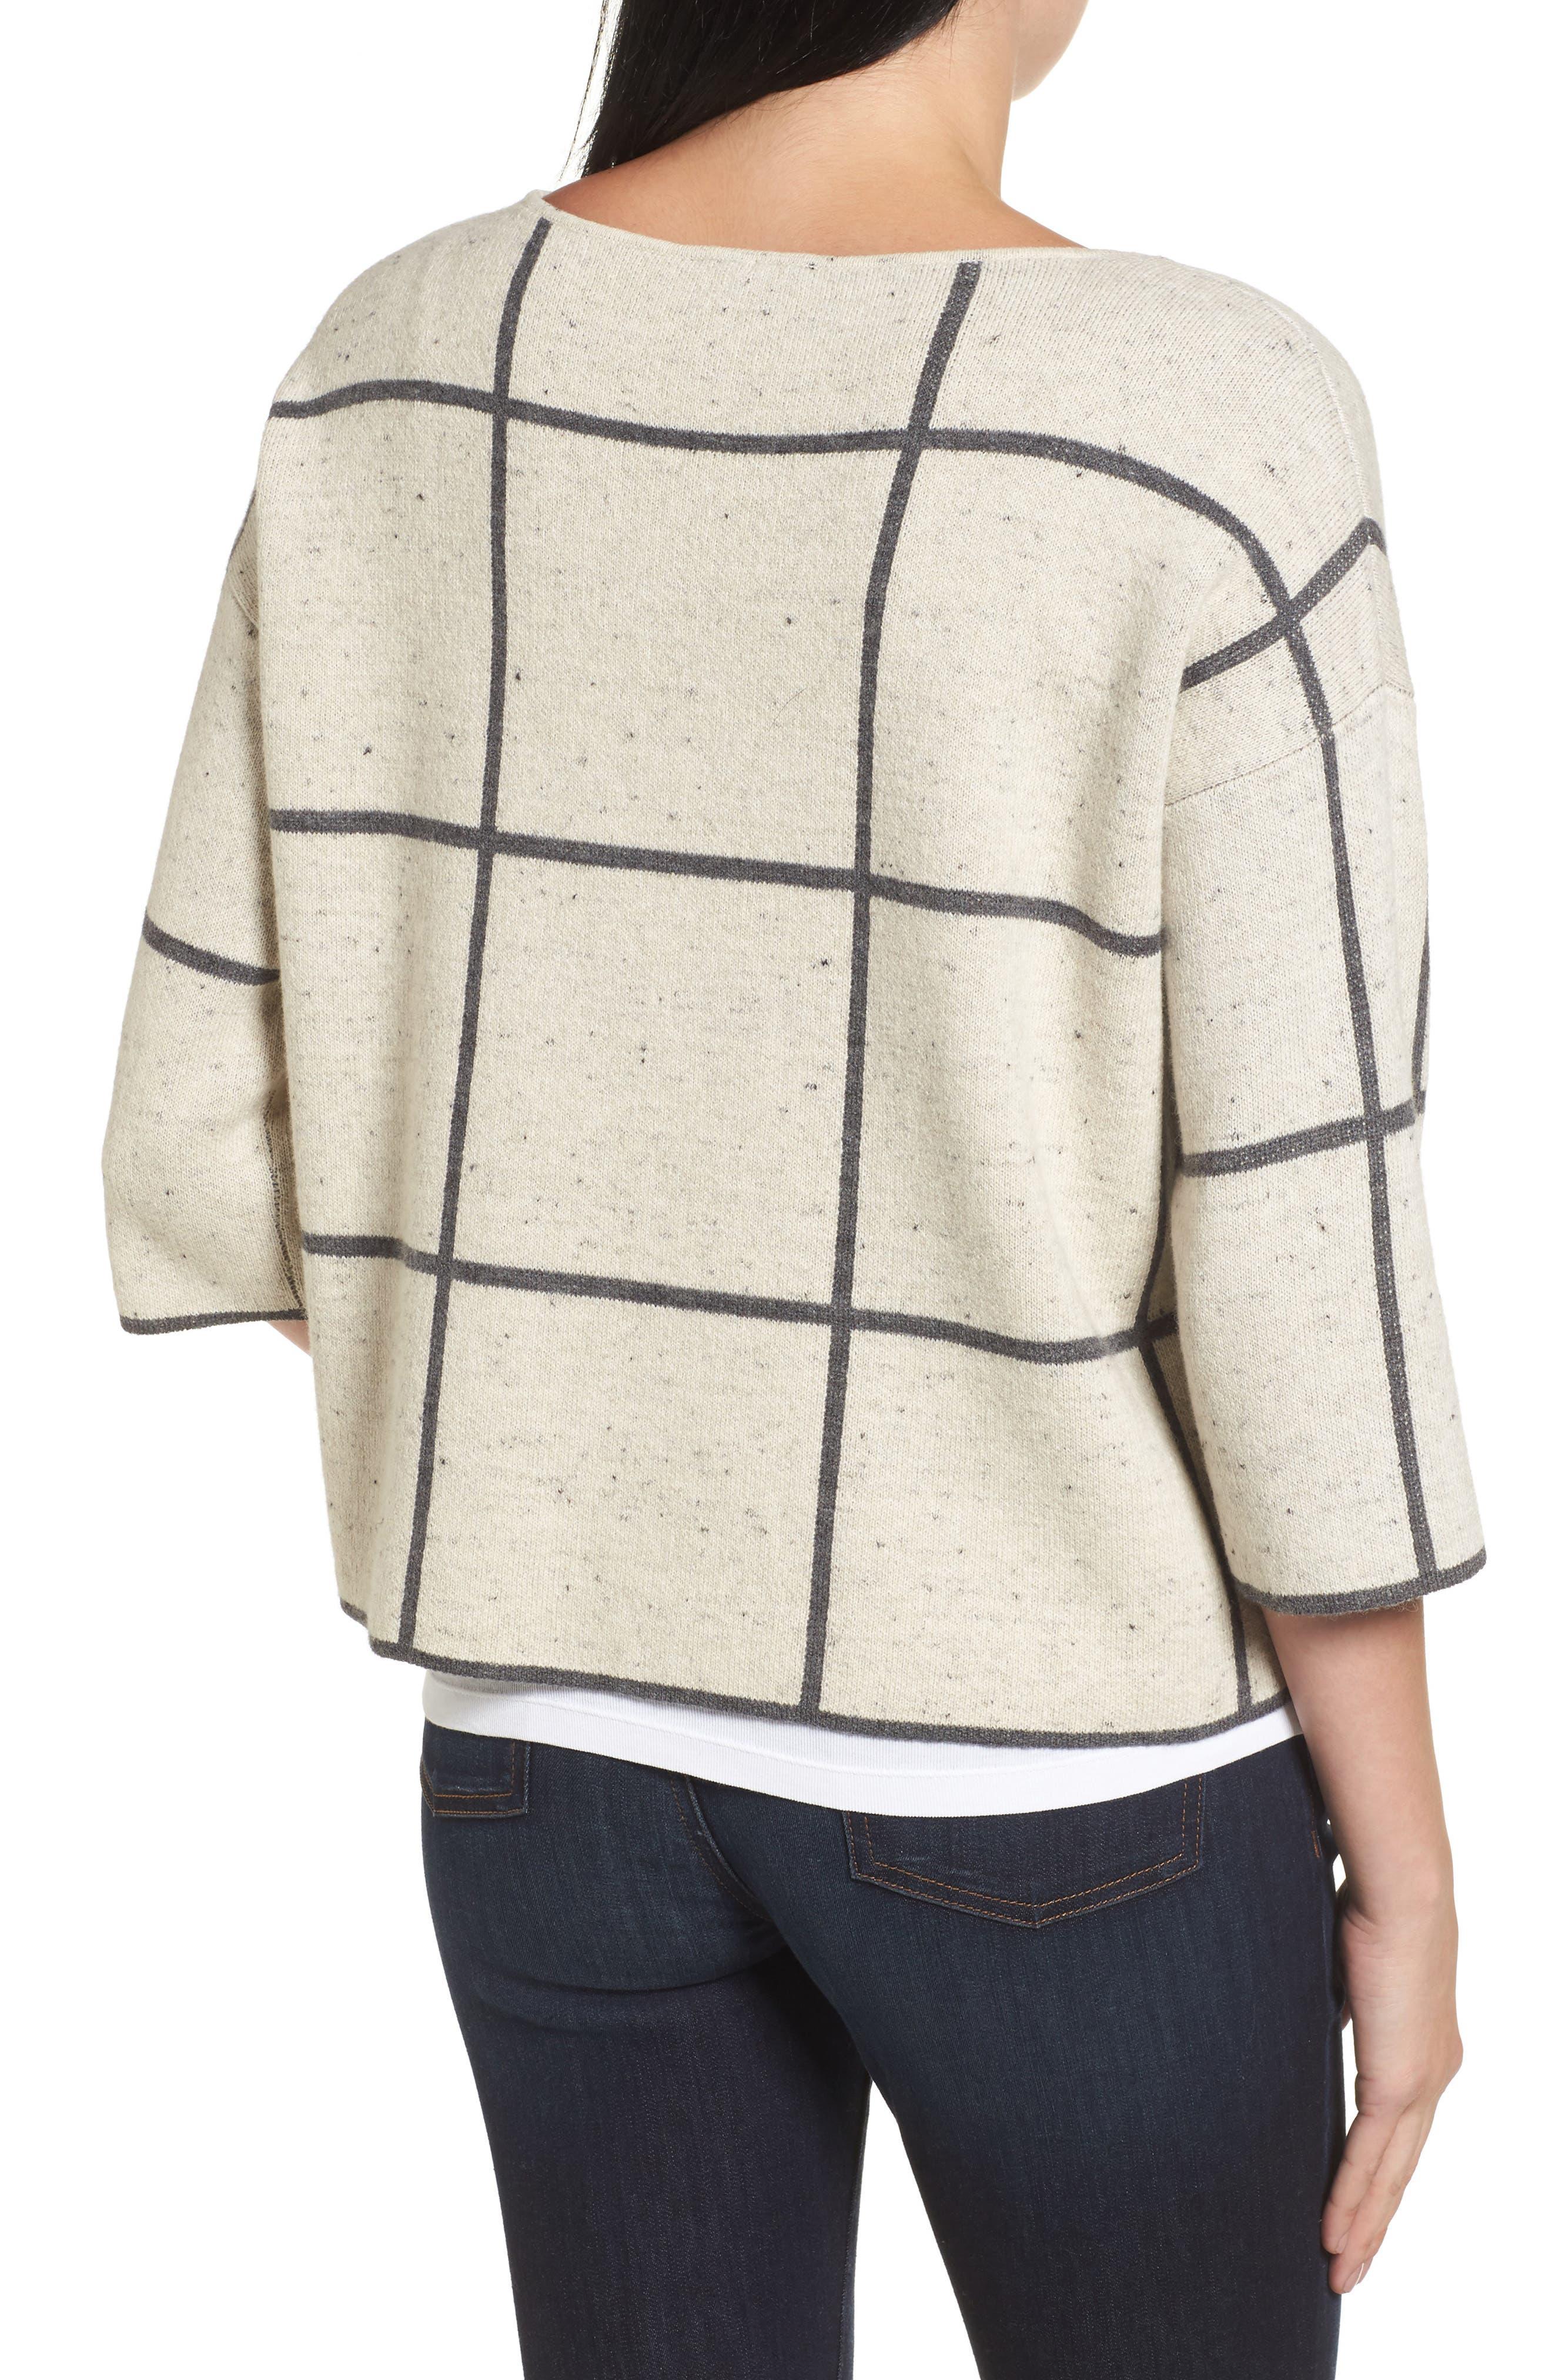 Windowpane Check Boxy Sweater,                             Alternate thumbnail 2, color,                             264